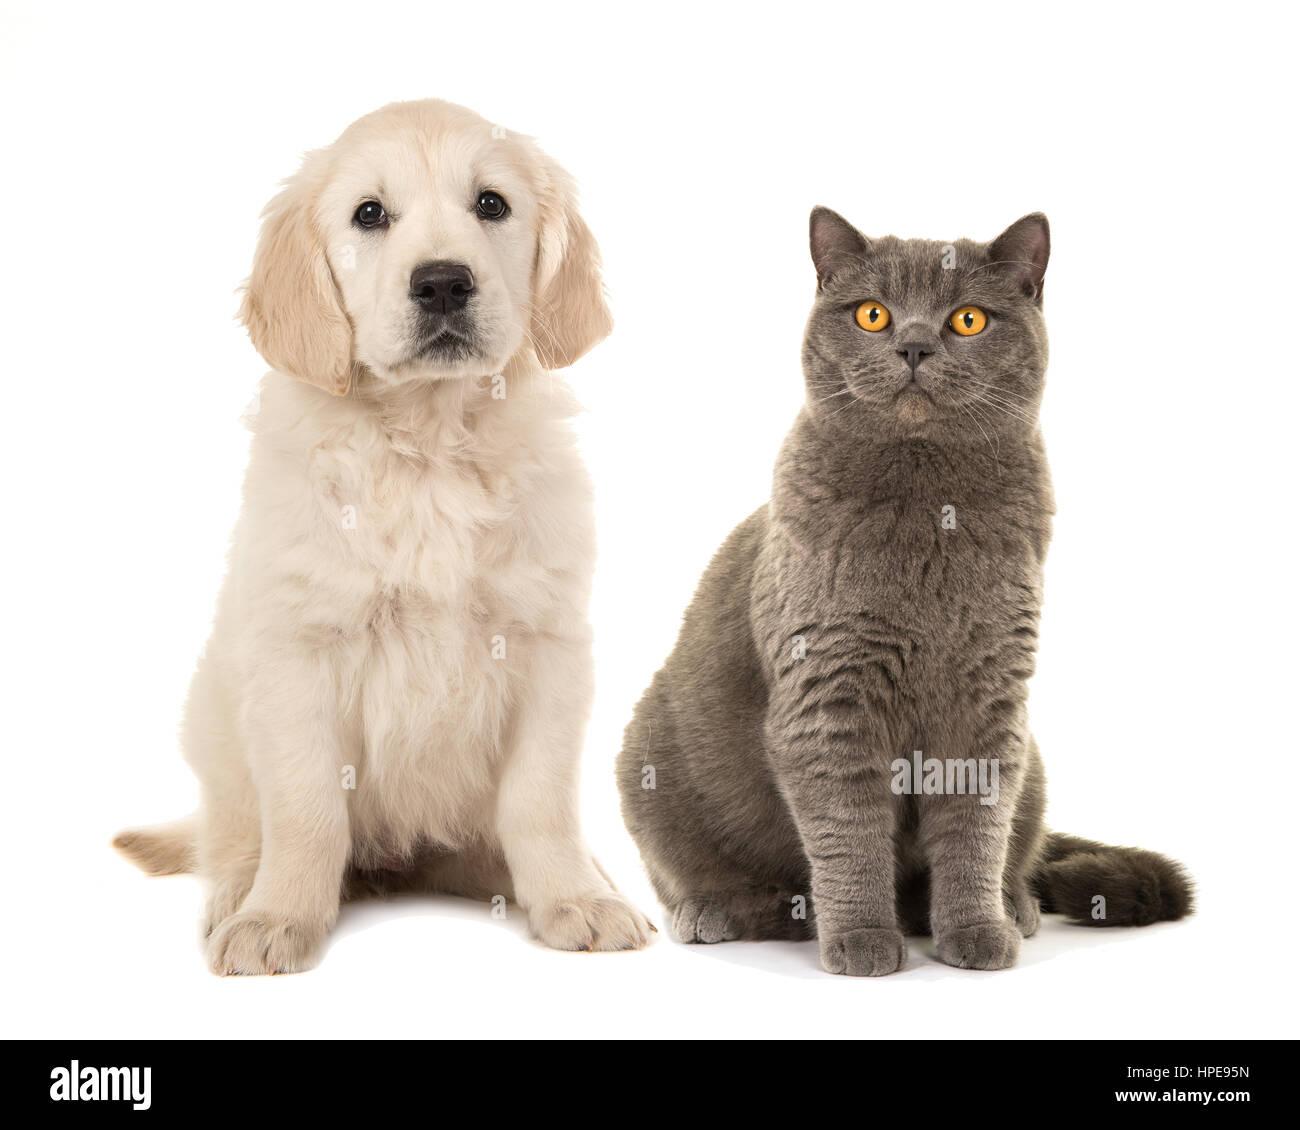 Blond Golden Retriever Puppy Dog And Grey British Short Hair Cat Stock Photo Alamy